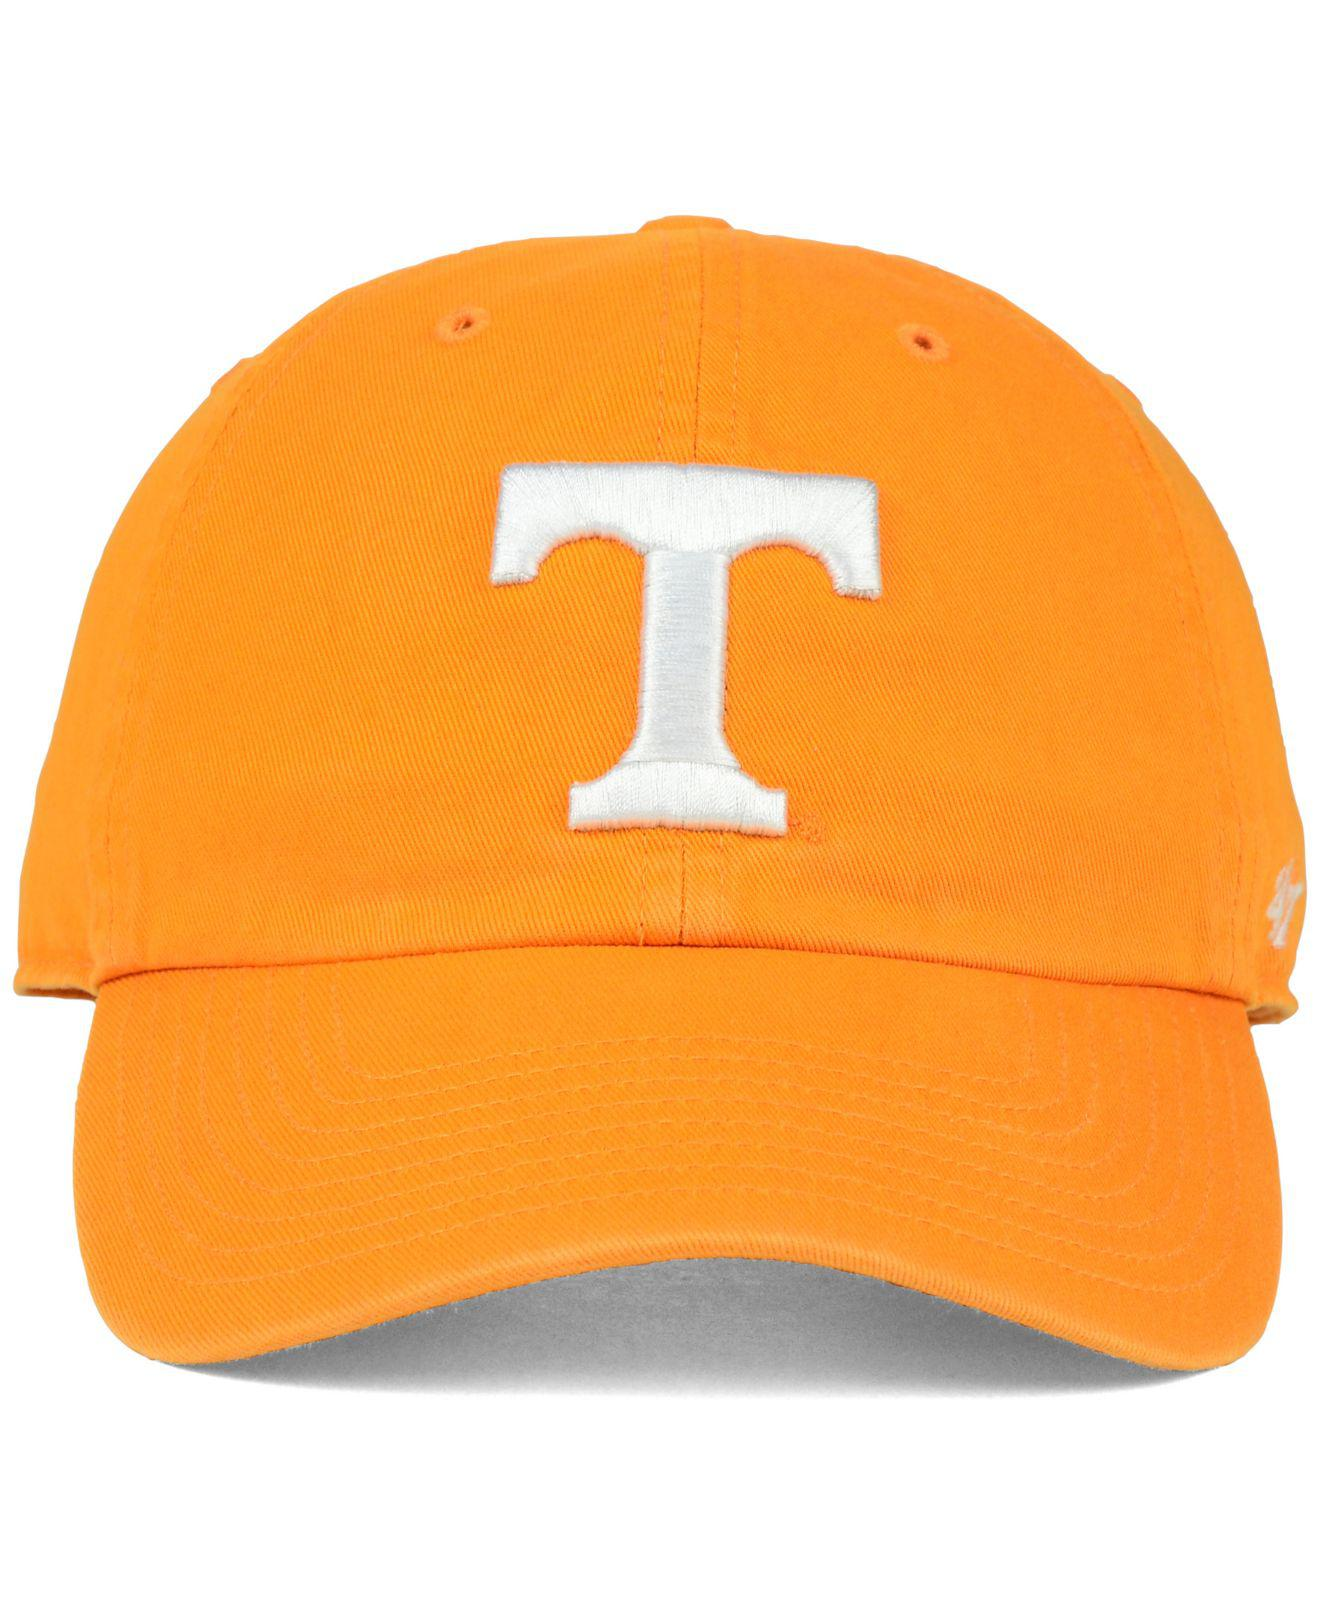 pretty nice 8cbc2 ec9c9 Lyst - 47 Brand Tennessee Volunteers Clean Up Cap in Orange - Save 30%